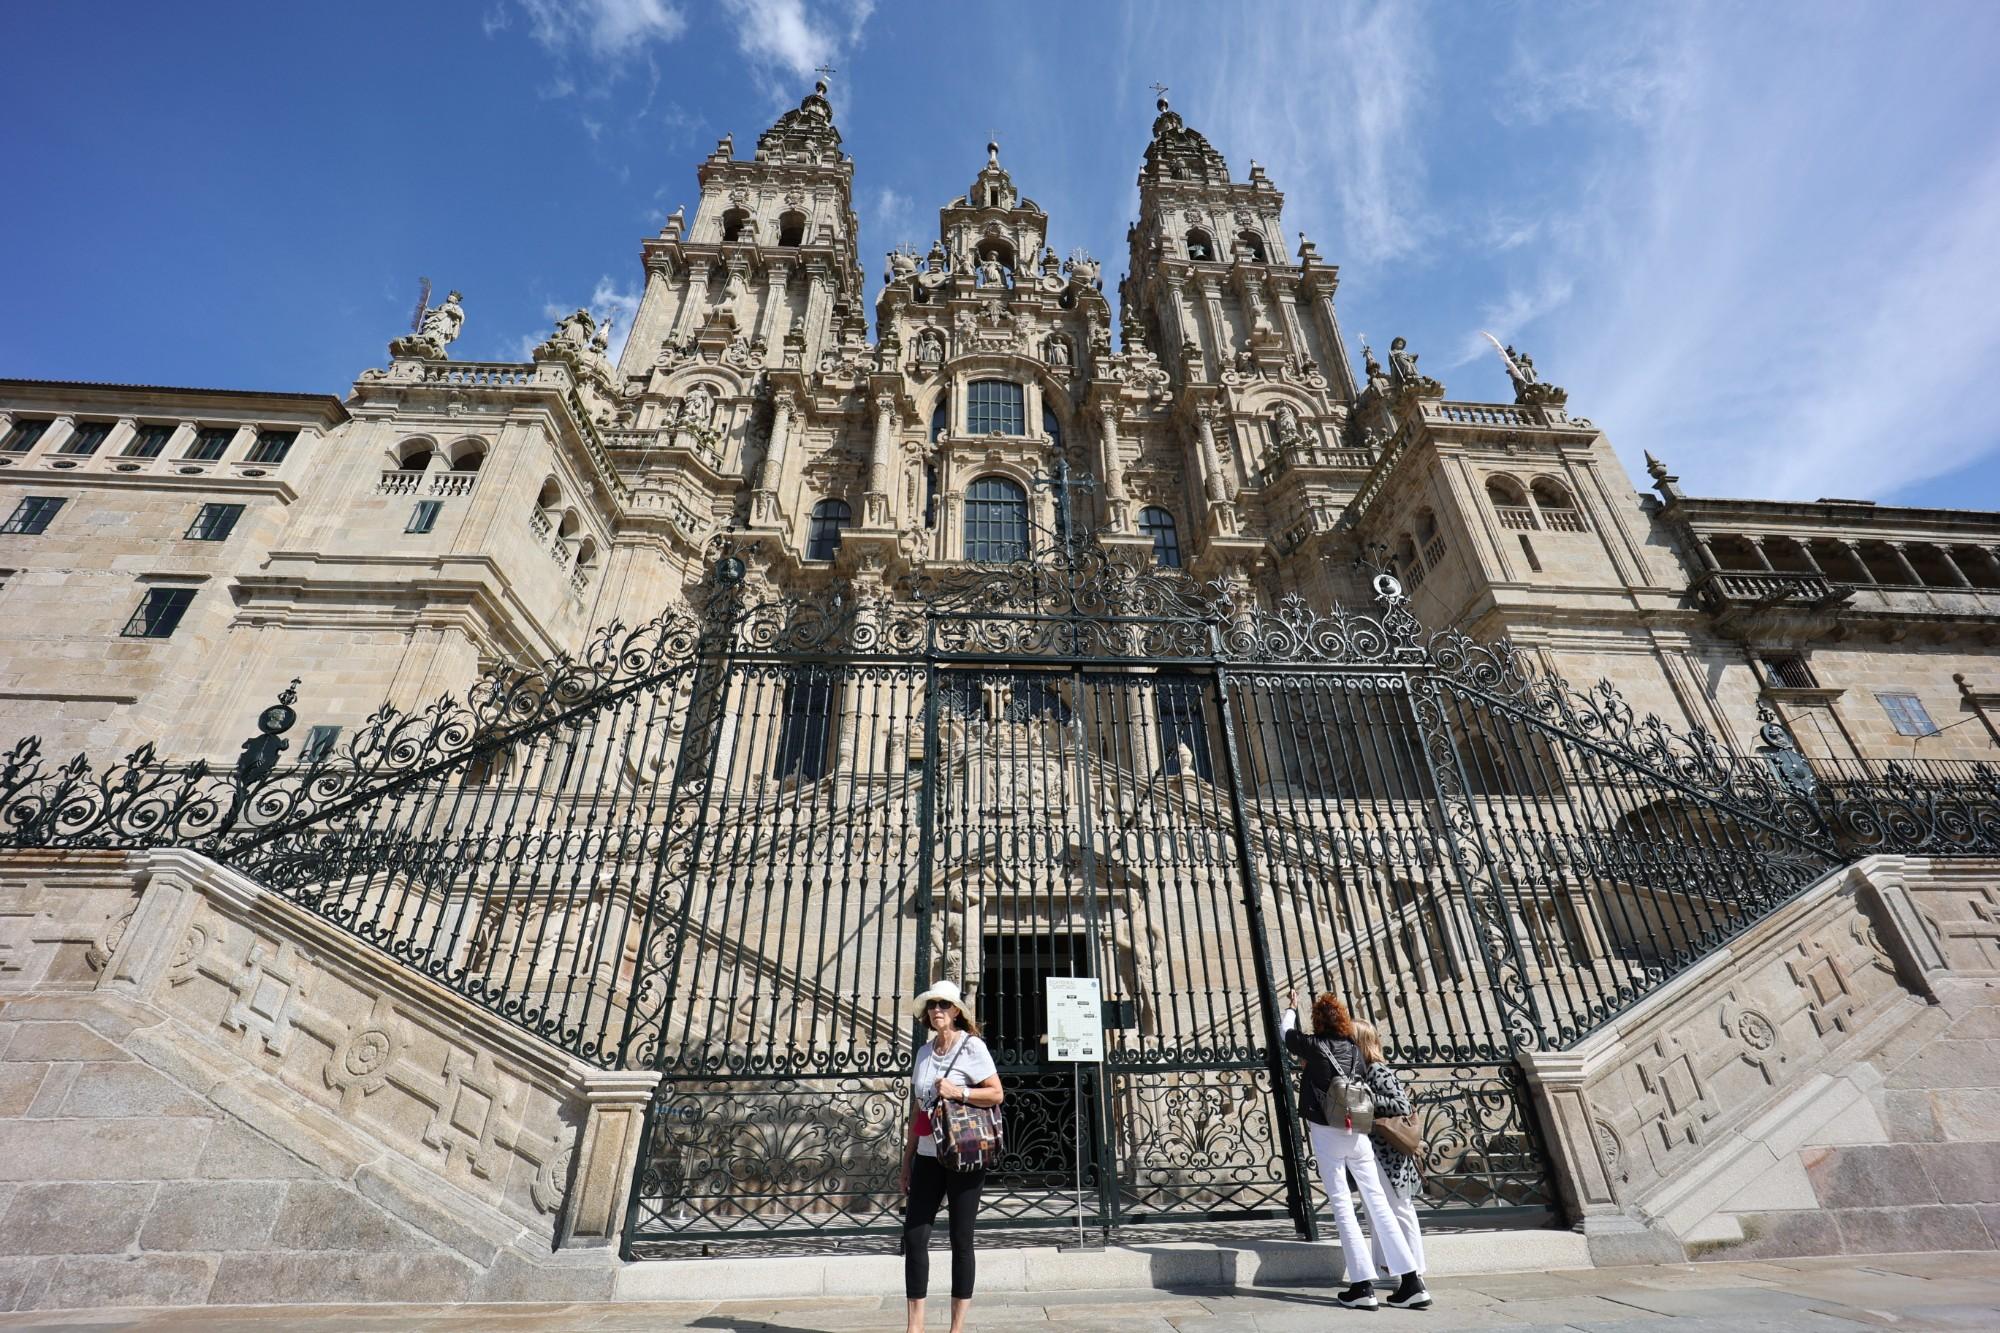 22 septembre : Santiago de Compostela